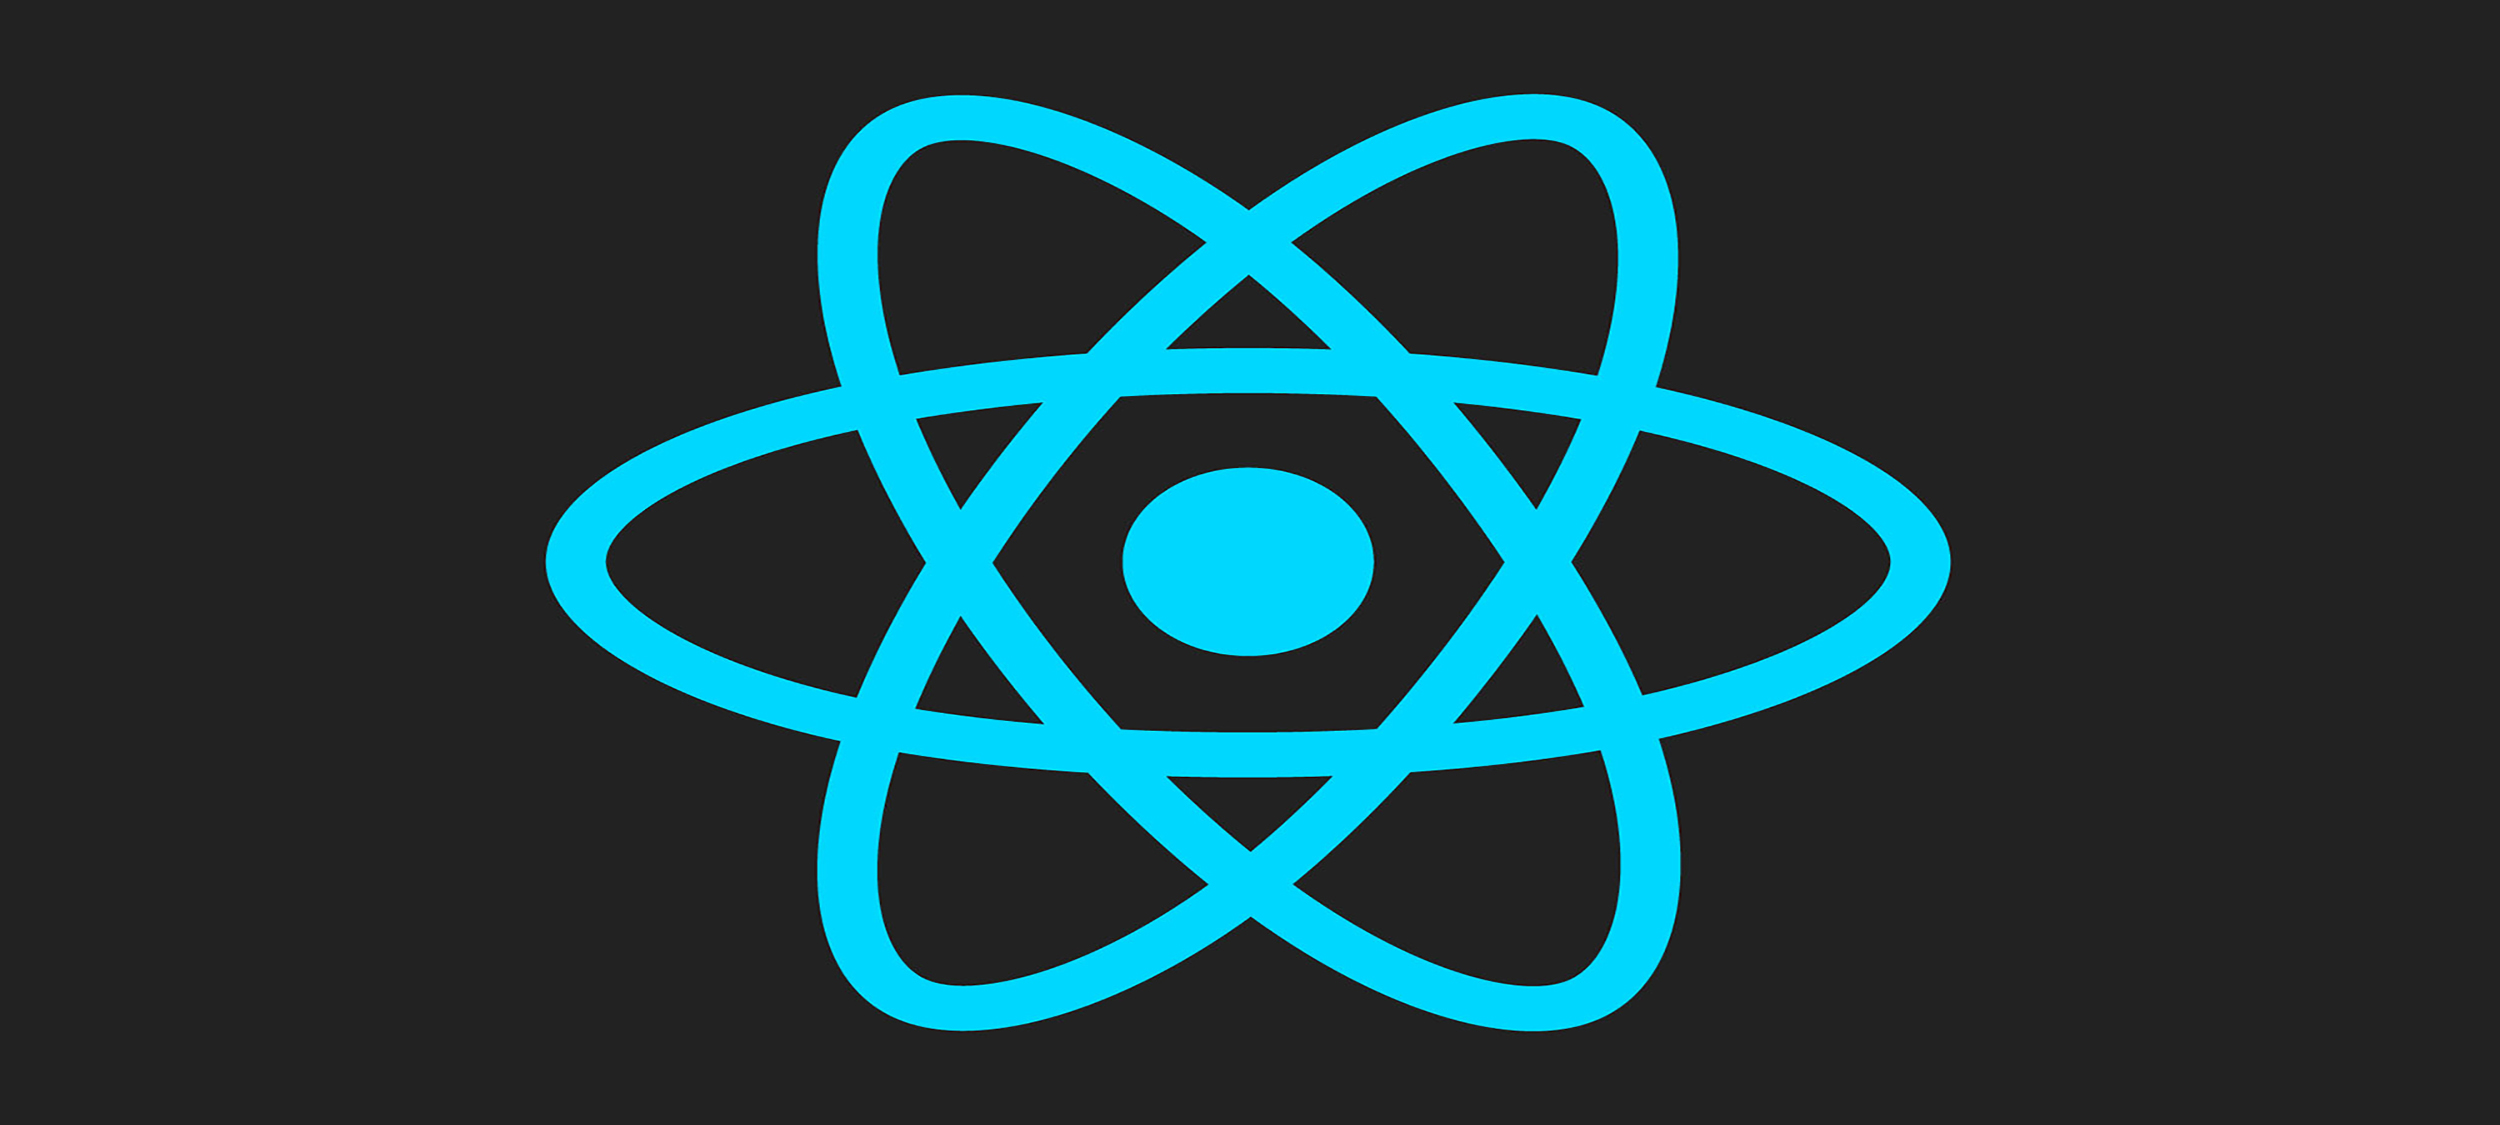 React Logosu